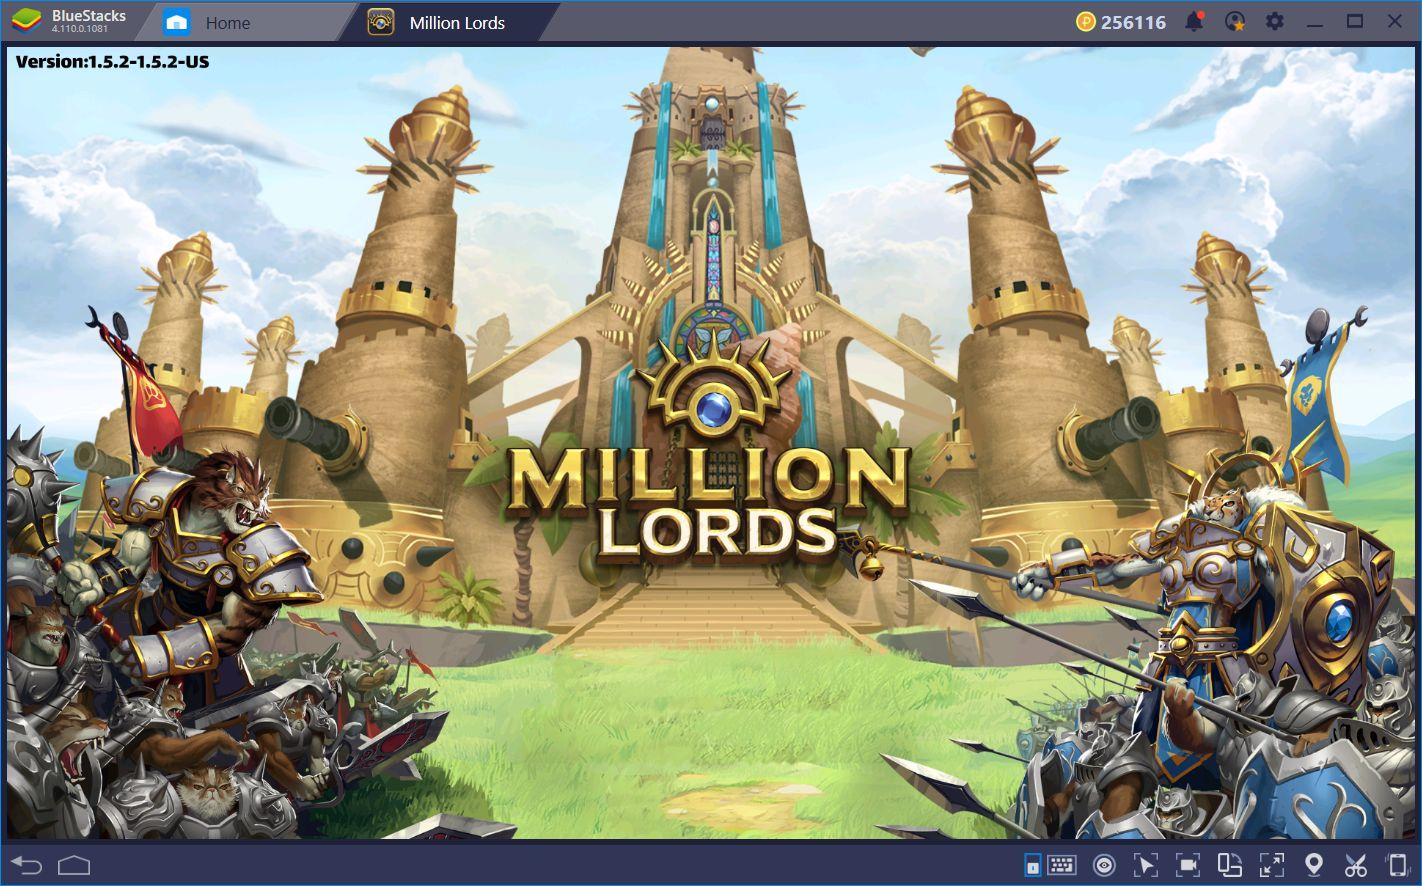 Million Lords on BlueStacks: Mobile Strategy, Abridged